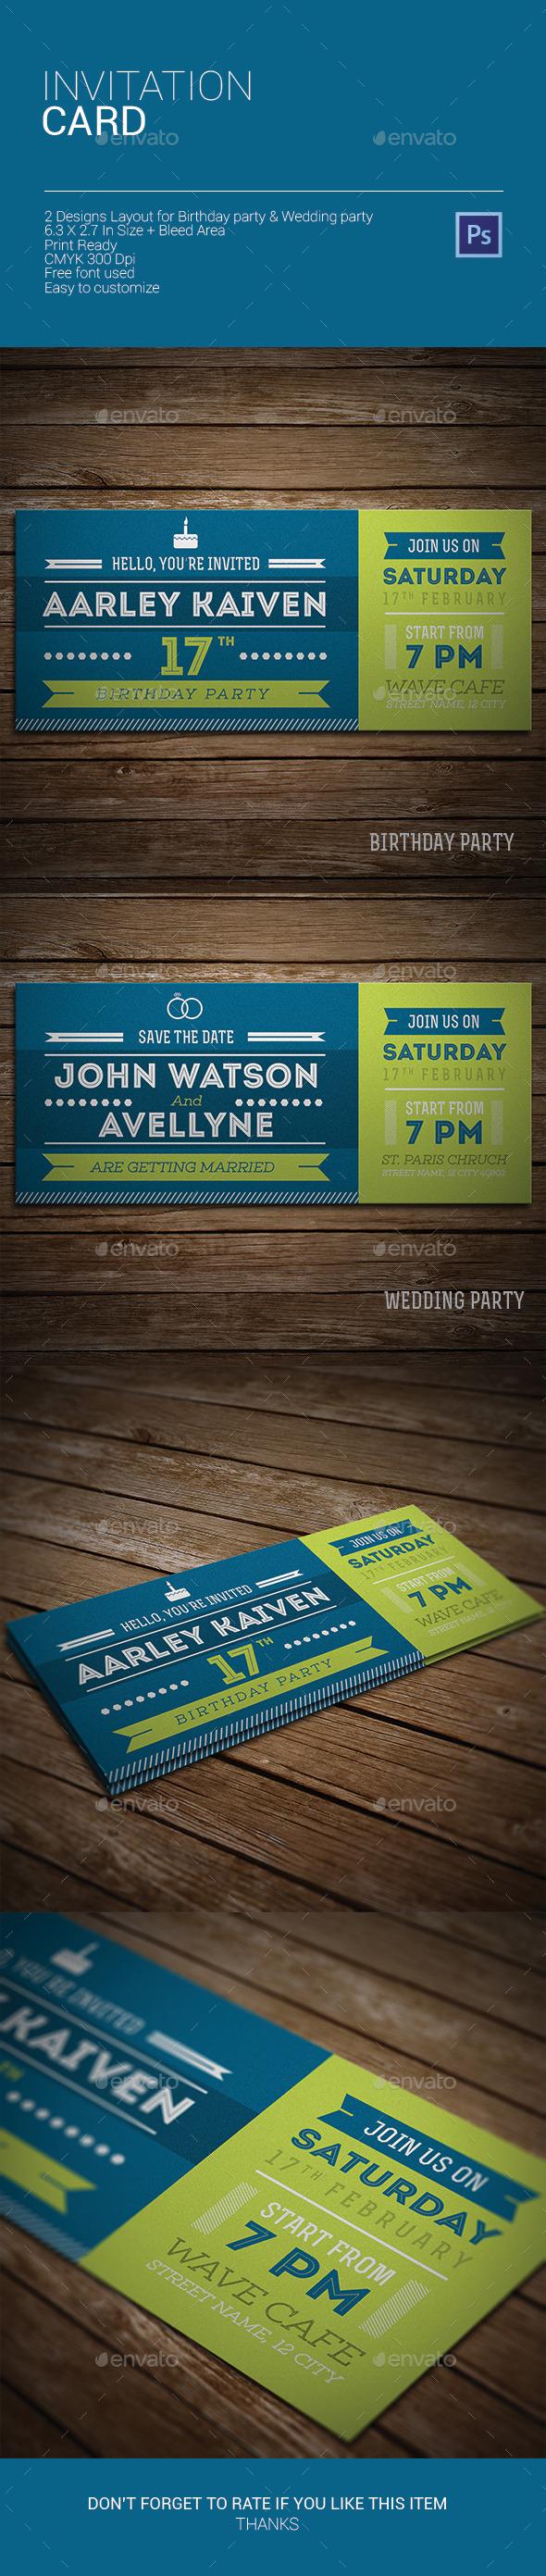 Invitation Card - Invitations Cards & Invites